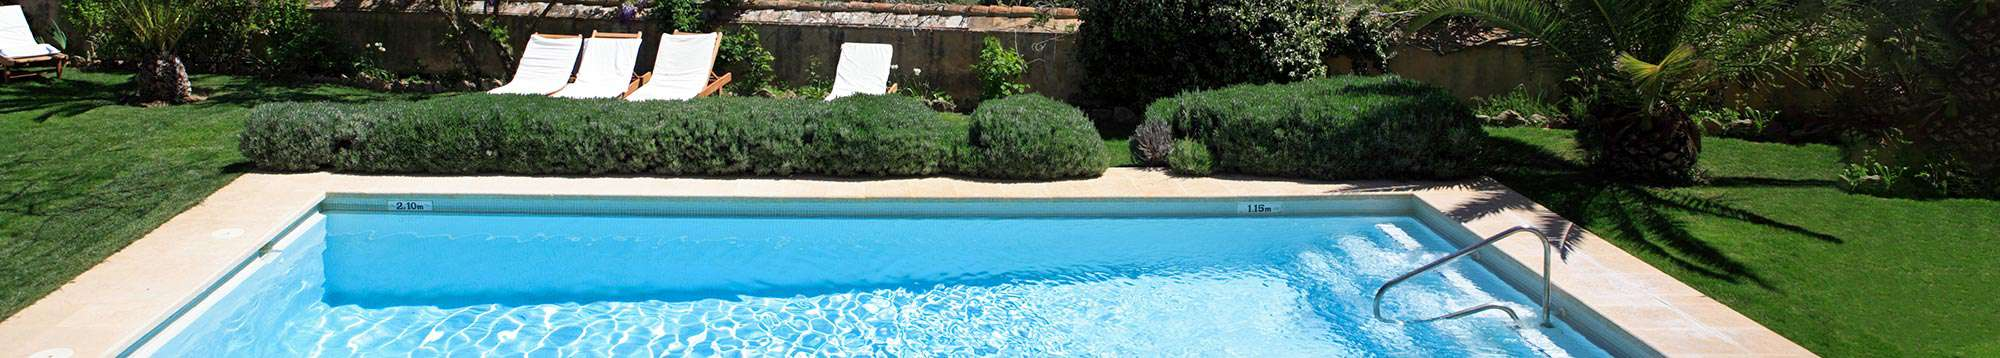 Week end e soggiorni in entroterra con piscina